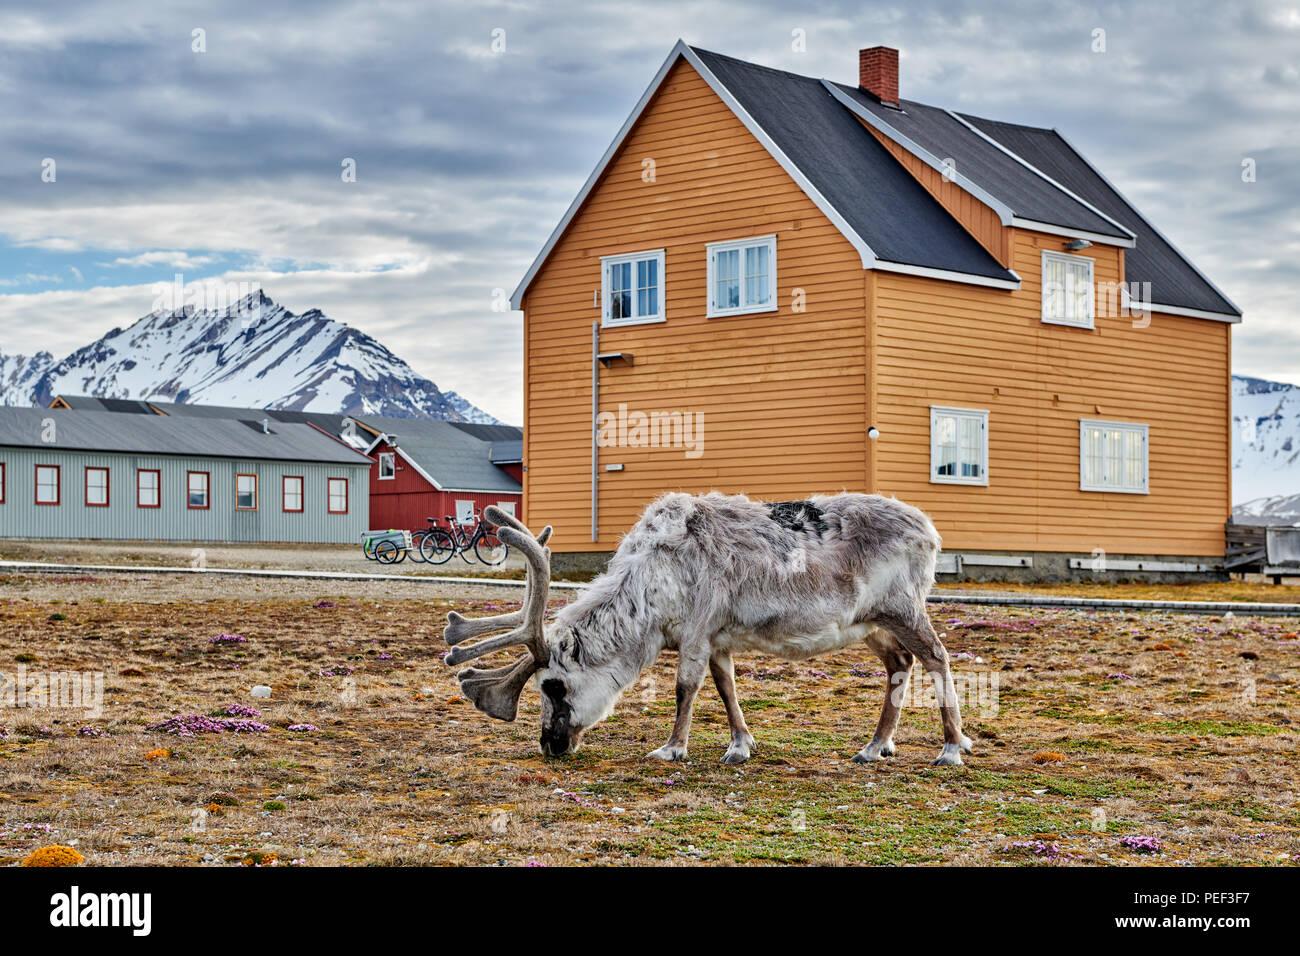 Svalbard reindeer (Rangifer tarandus platyrhynchus) in town of Ny-Ålesund, Svalbard or Spitsbergen, Europe - Stock Image